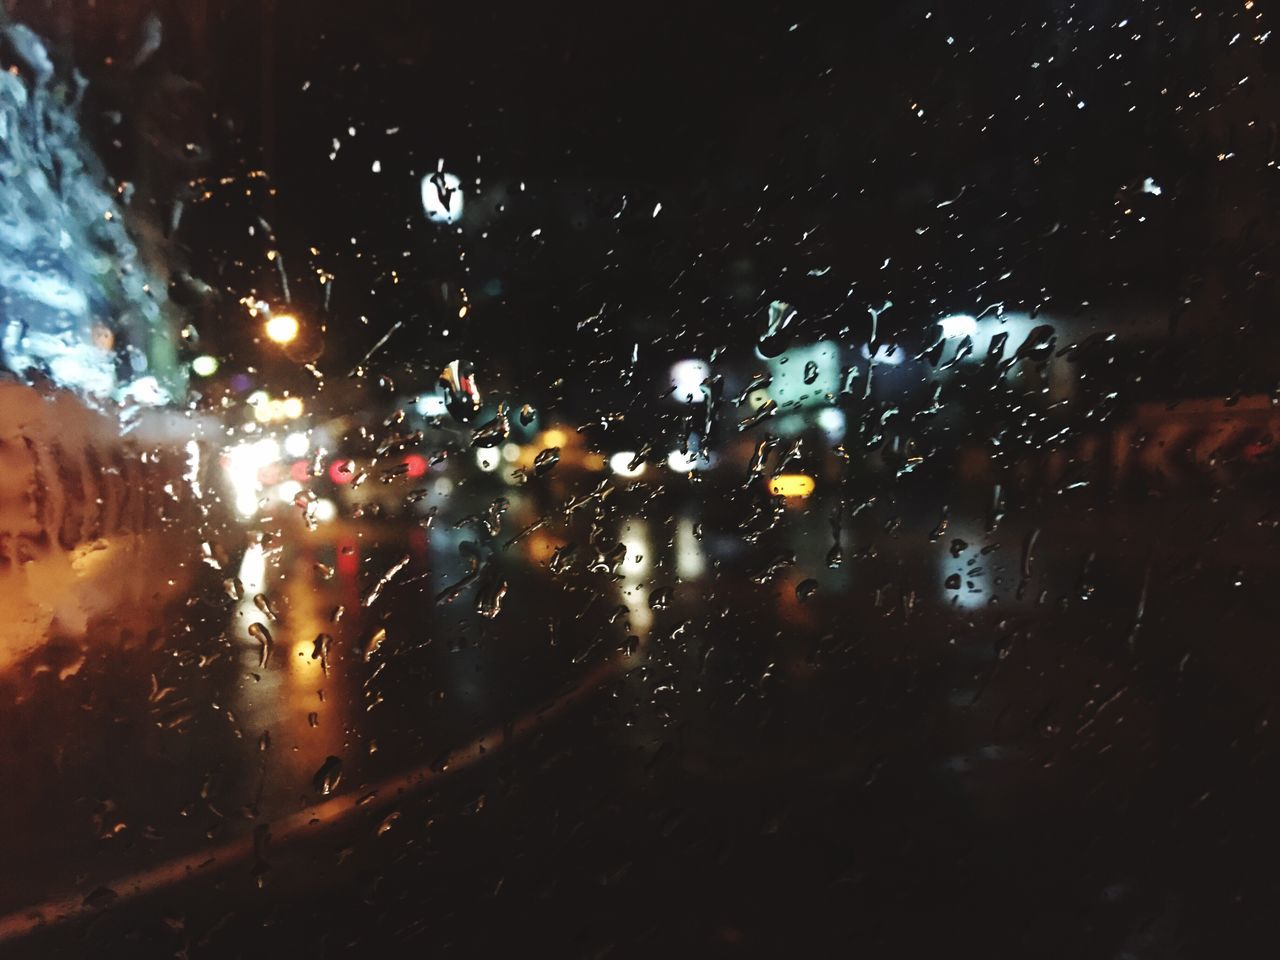 illuminated, window, wet, glass - material, night, weather, car, no people, raindrop, drop, car interior, windshield, transportation, land vehicle, indoors, water, close-up, sky